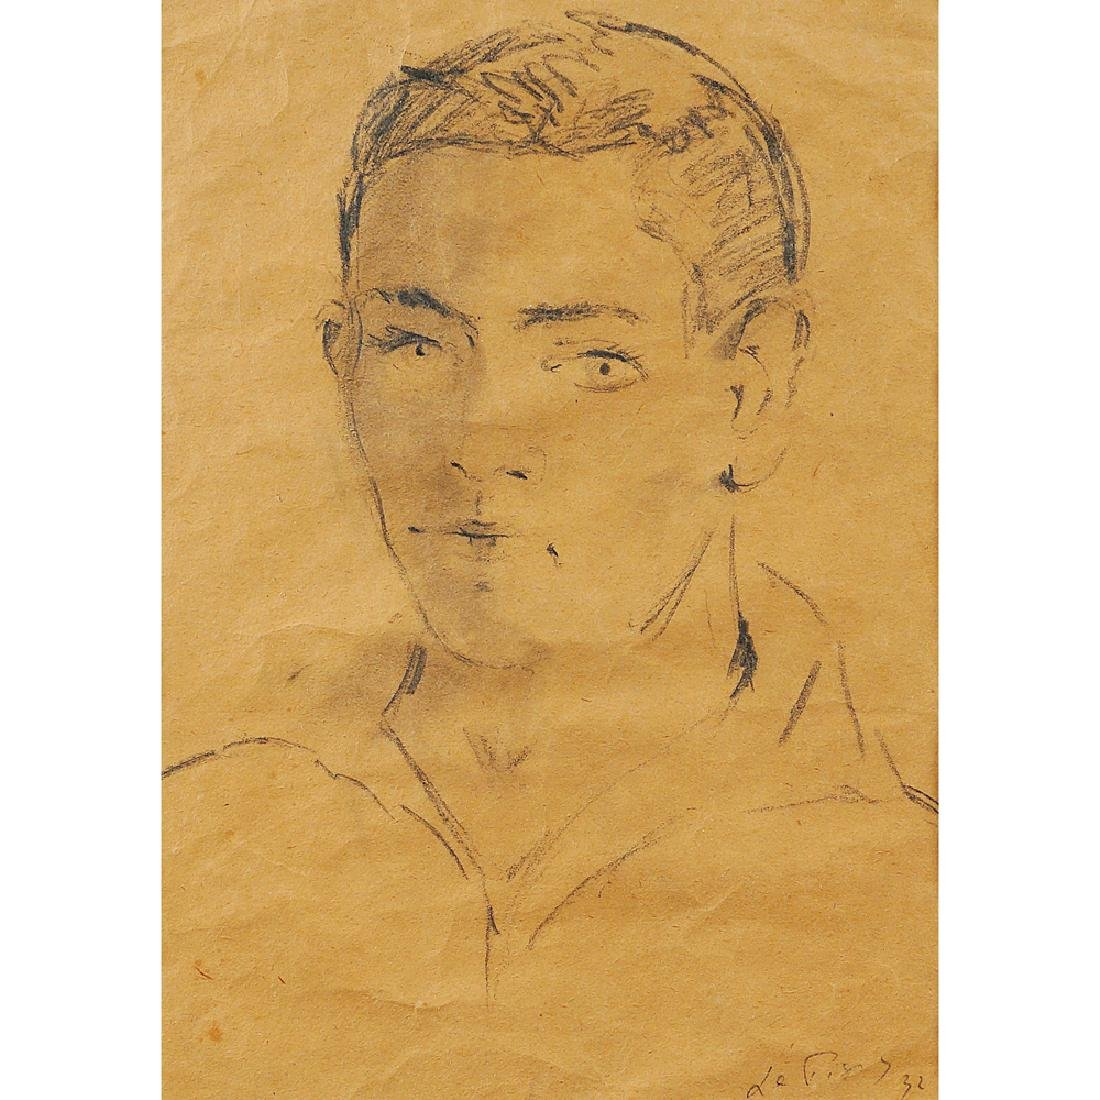 Filippo De Pisis Ferrara 1896 - Milano 1956 37.6x24.5